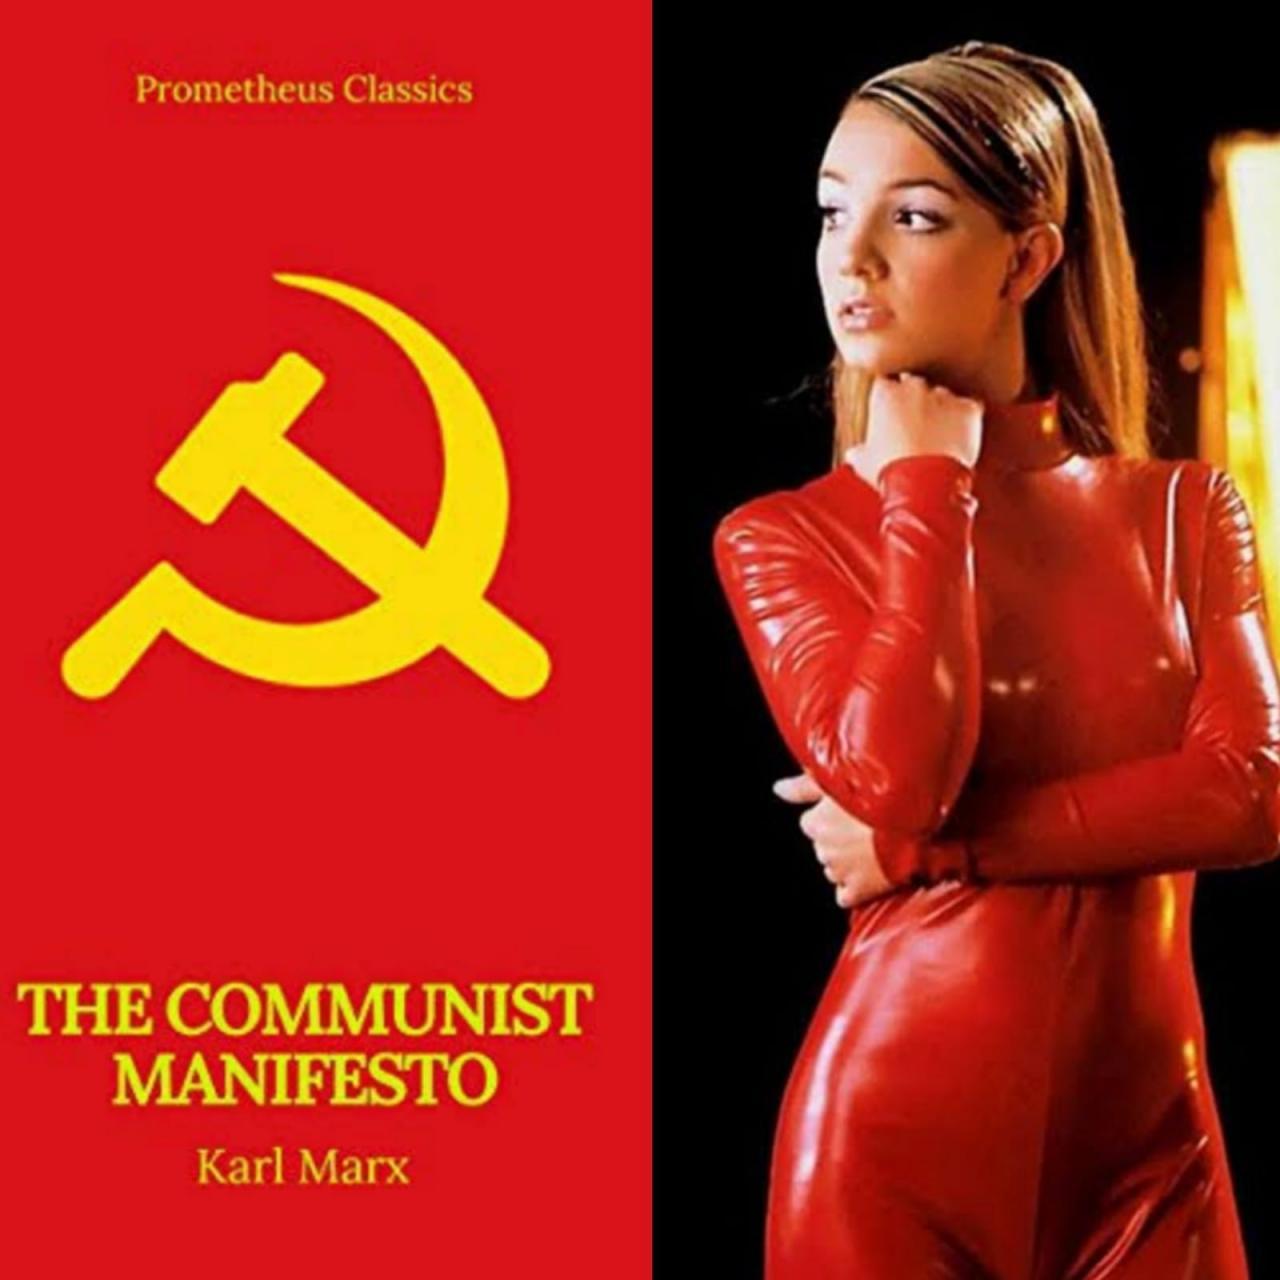 Memes de Britney Spears comunista